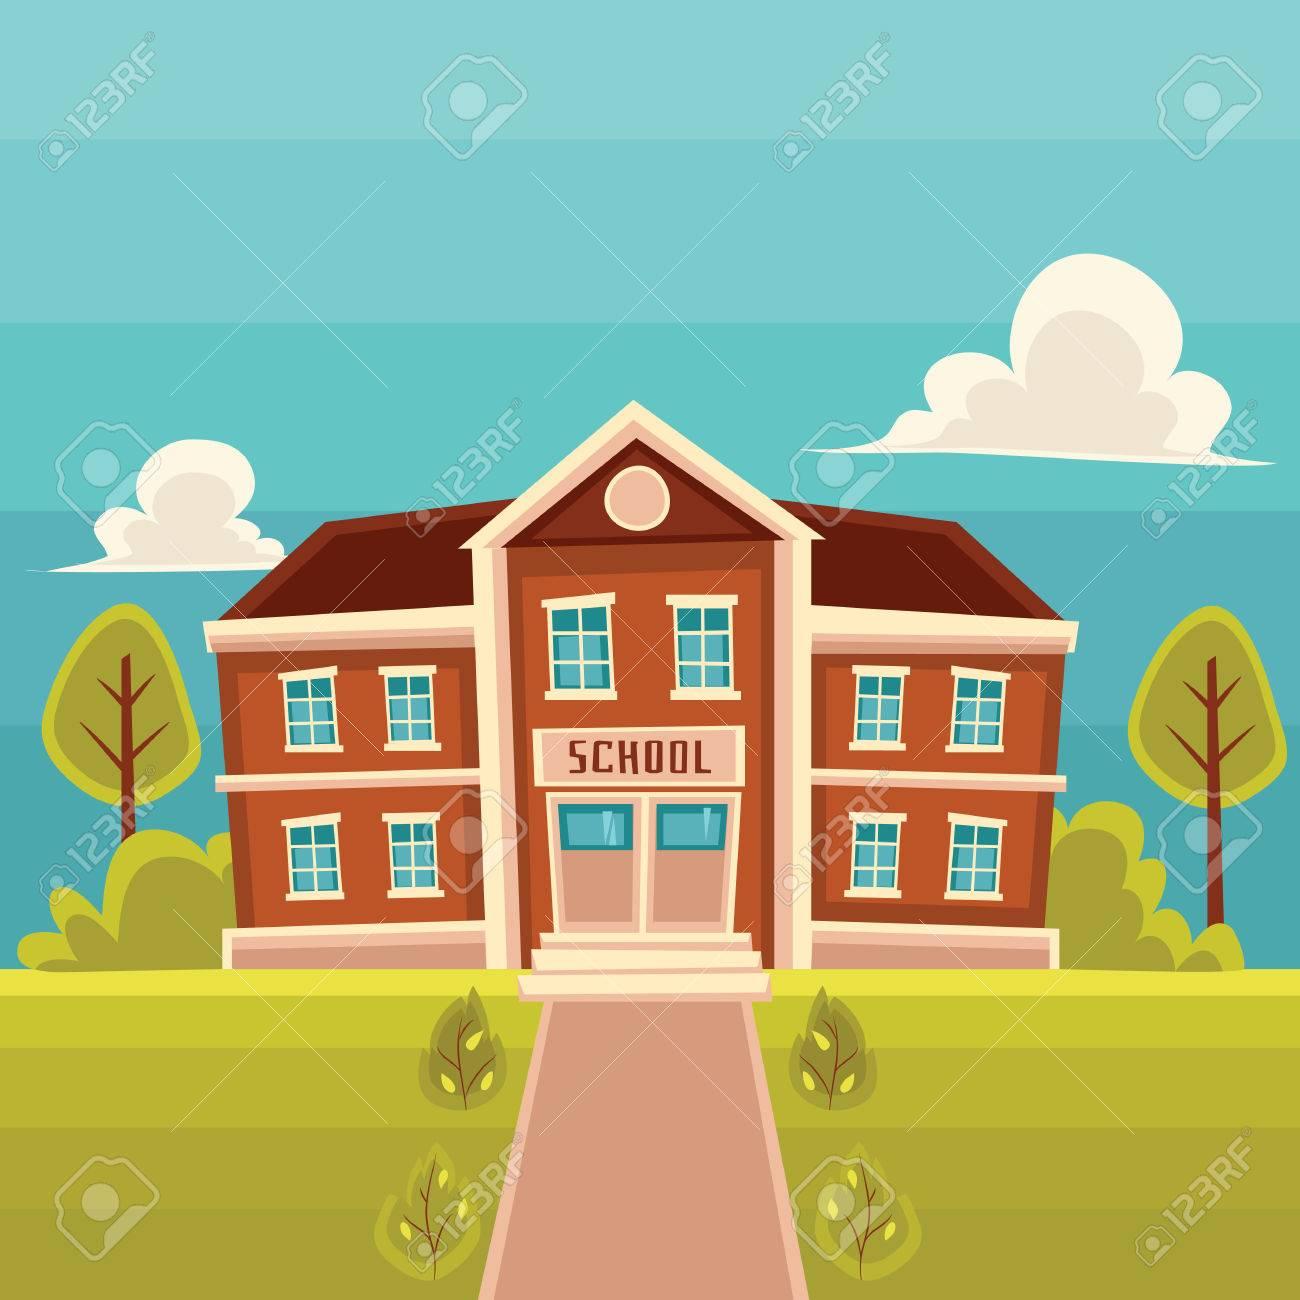 School building cartoon vector illustration on landscape background